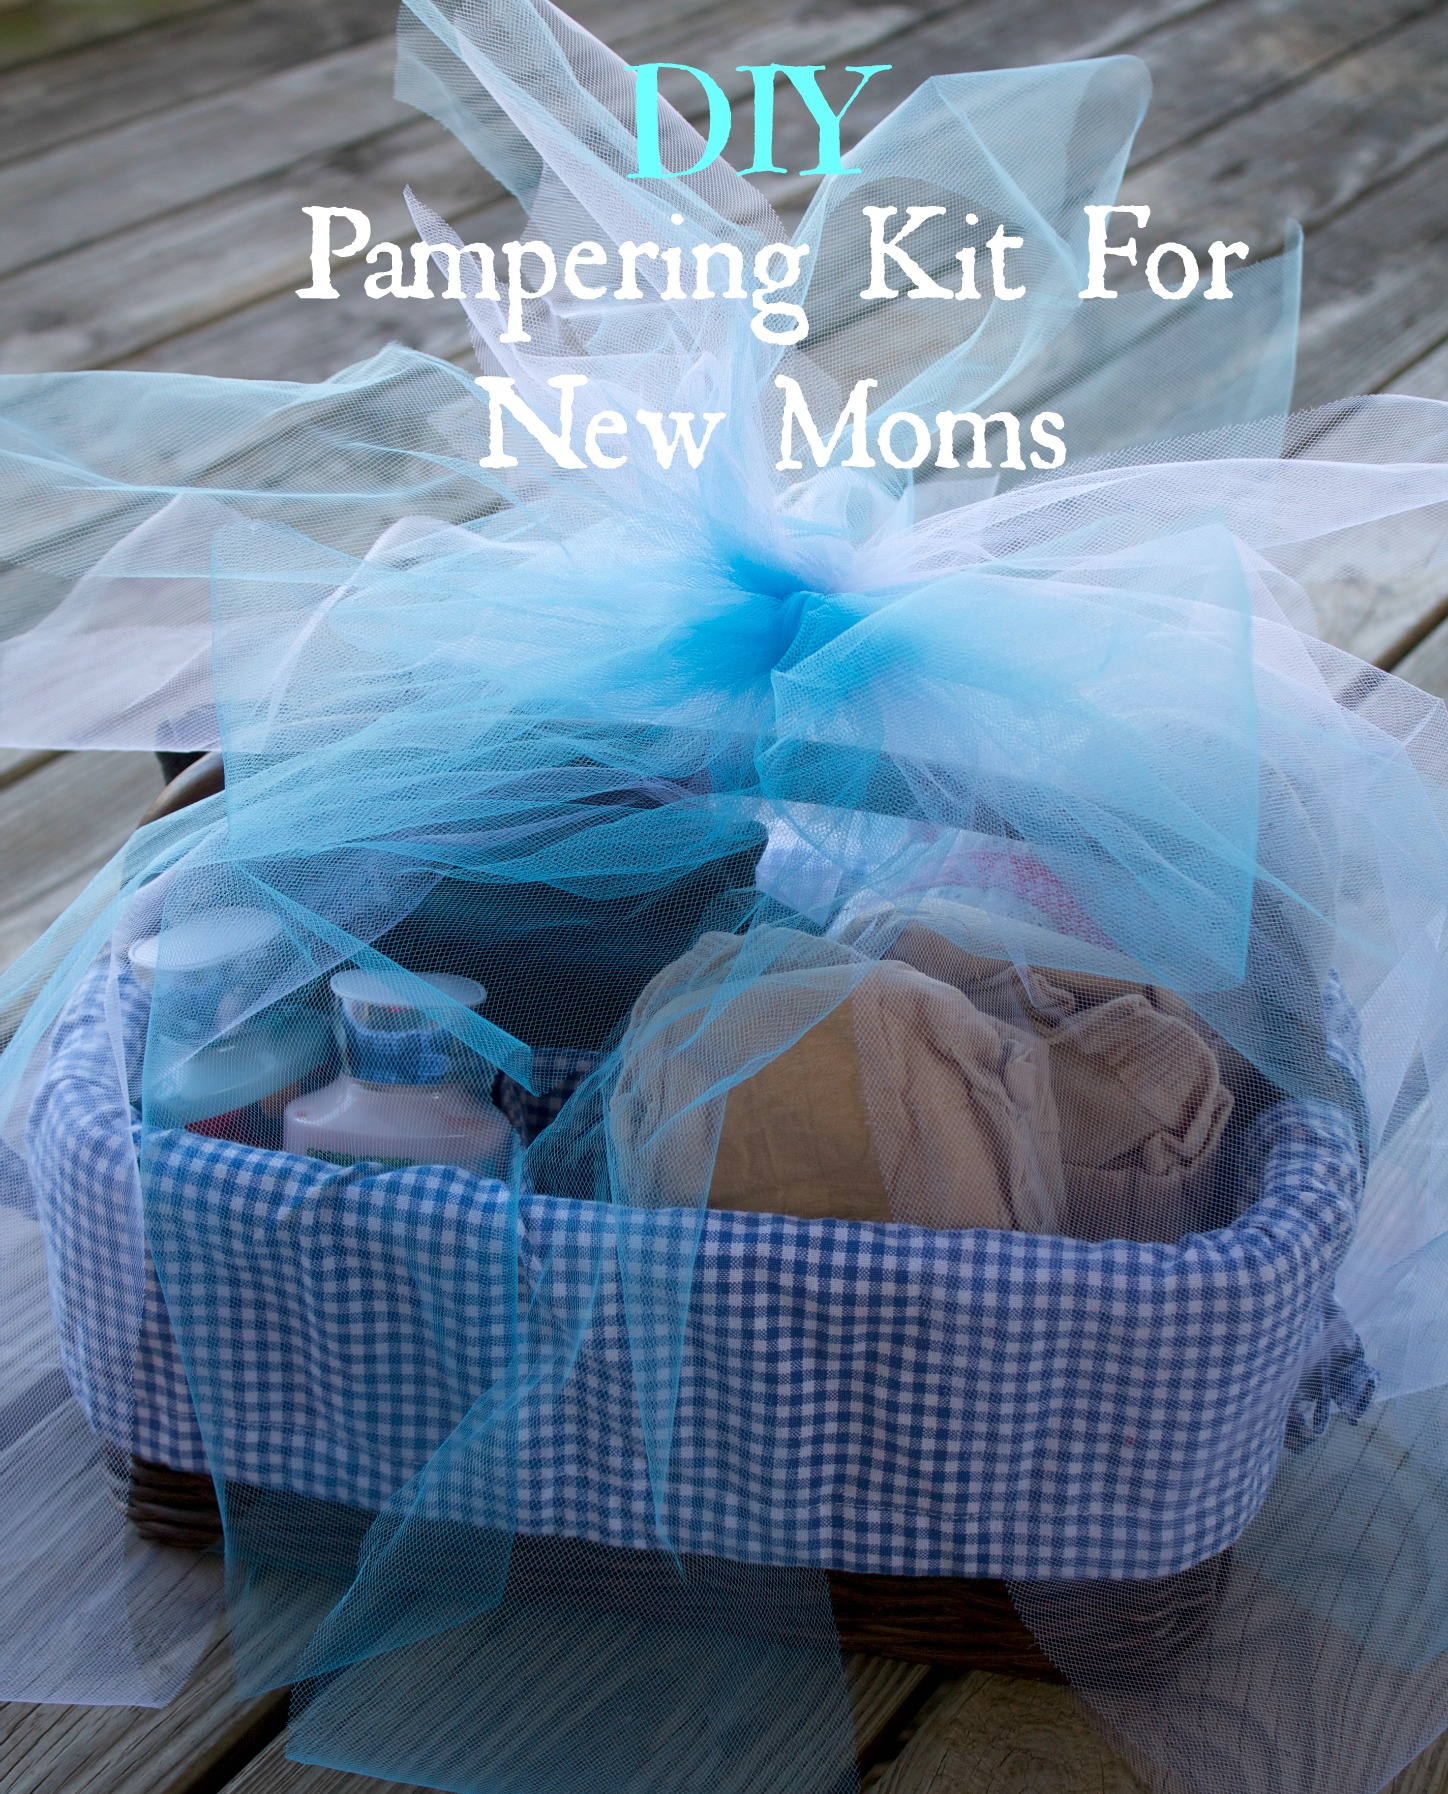 DIY pampering kit for new moms